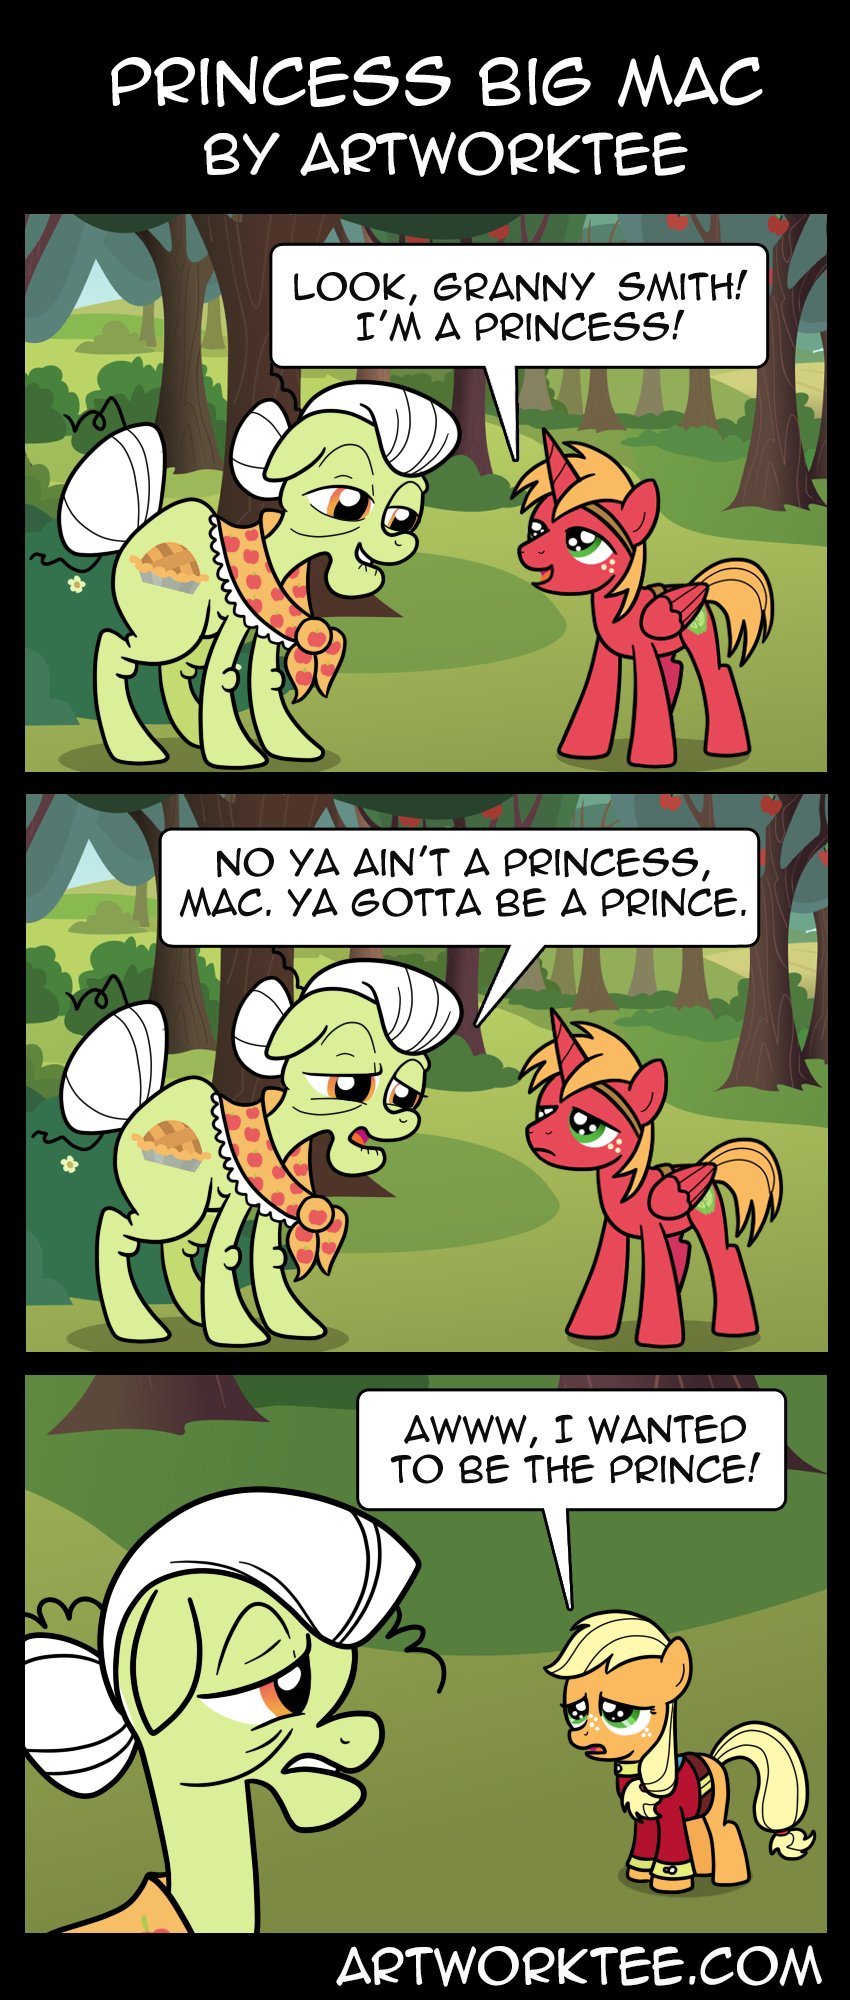 Princess Big Mac